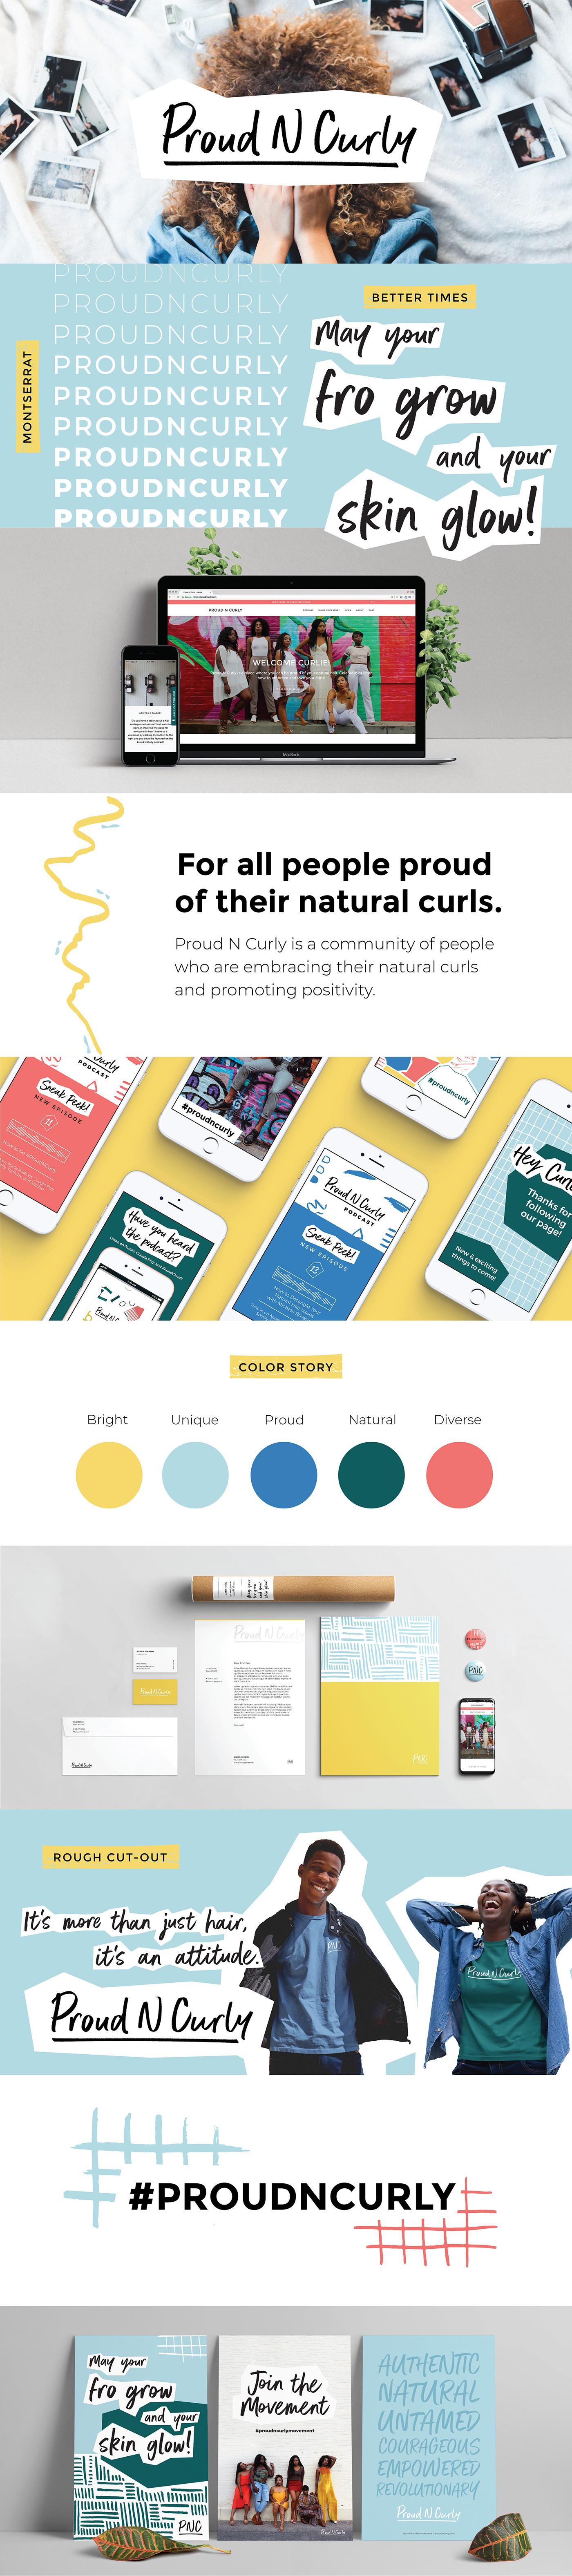 branding  graphic design  Logo Design print design  Web Design  brand strategy Social Media Content natural hair digital design